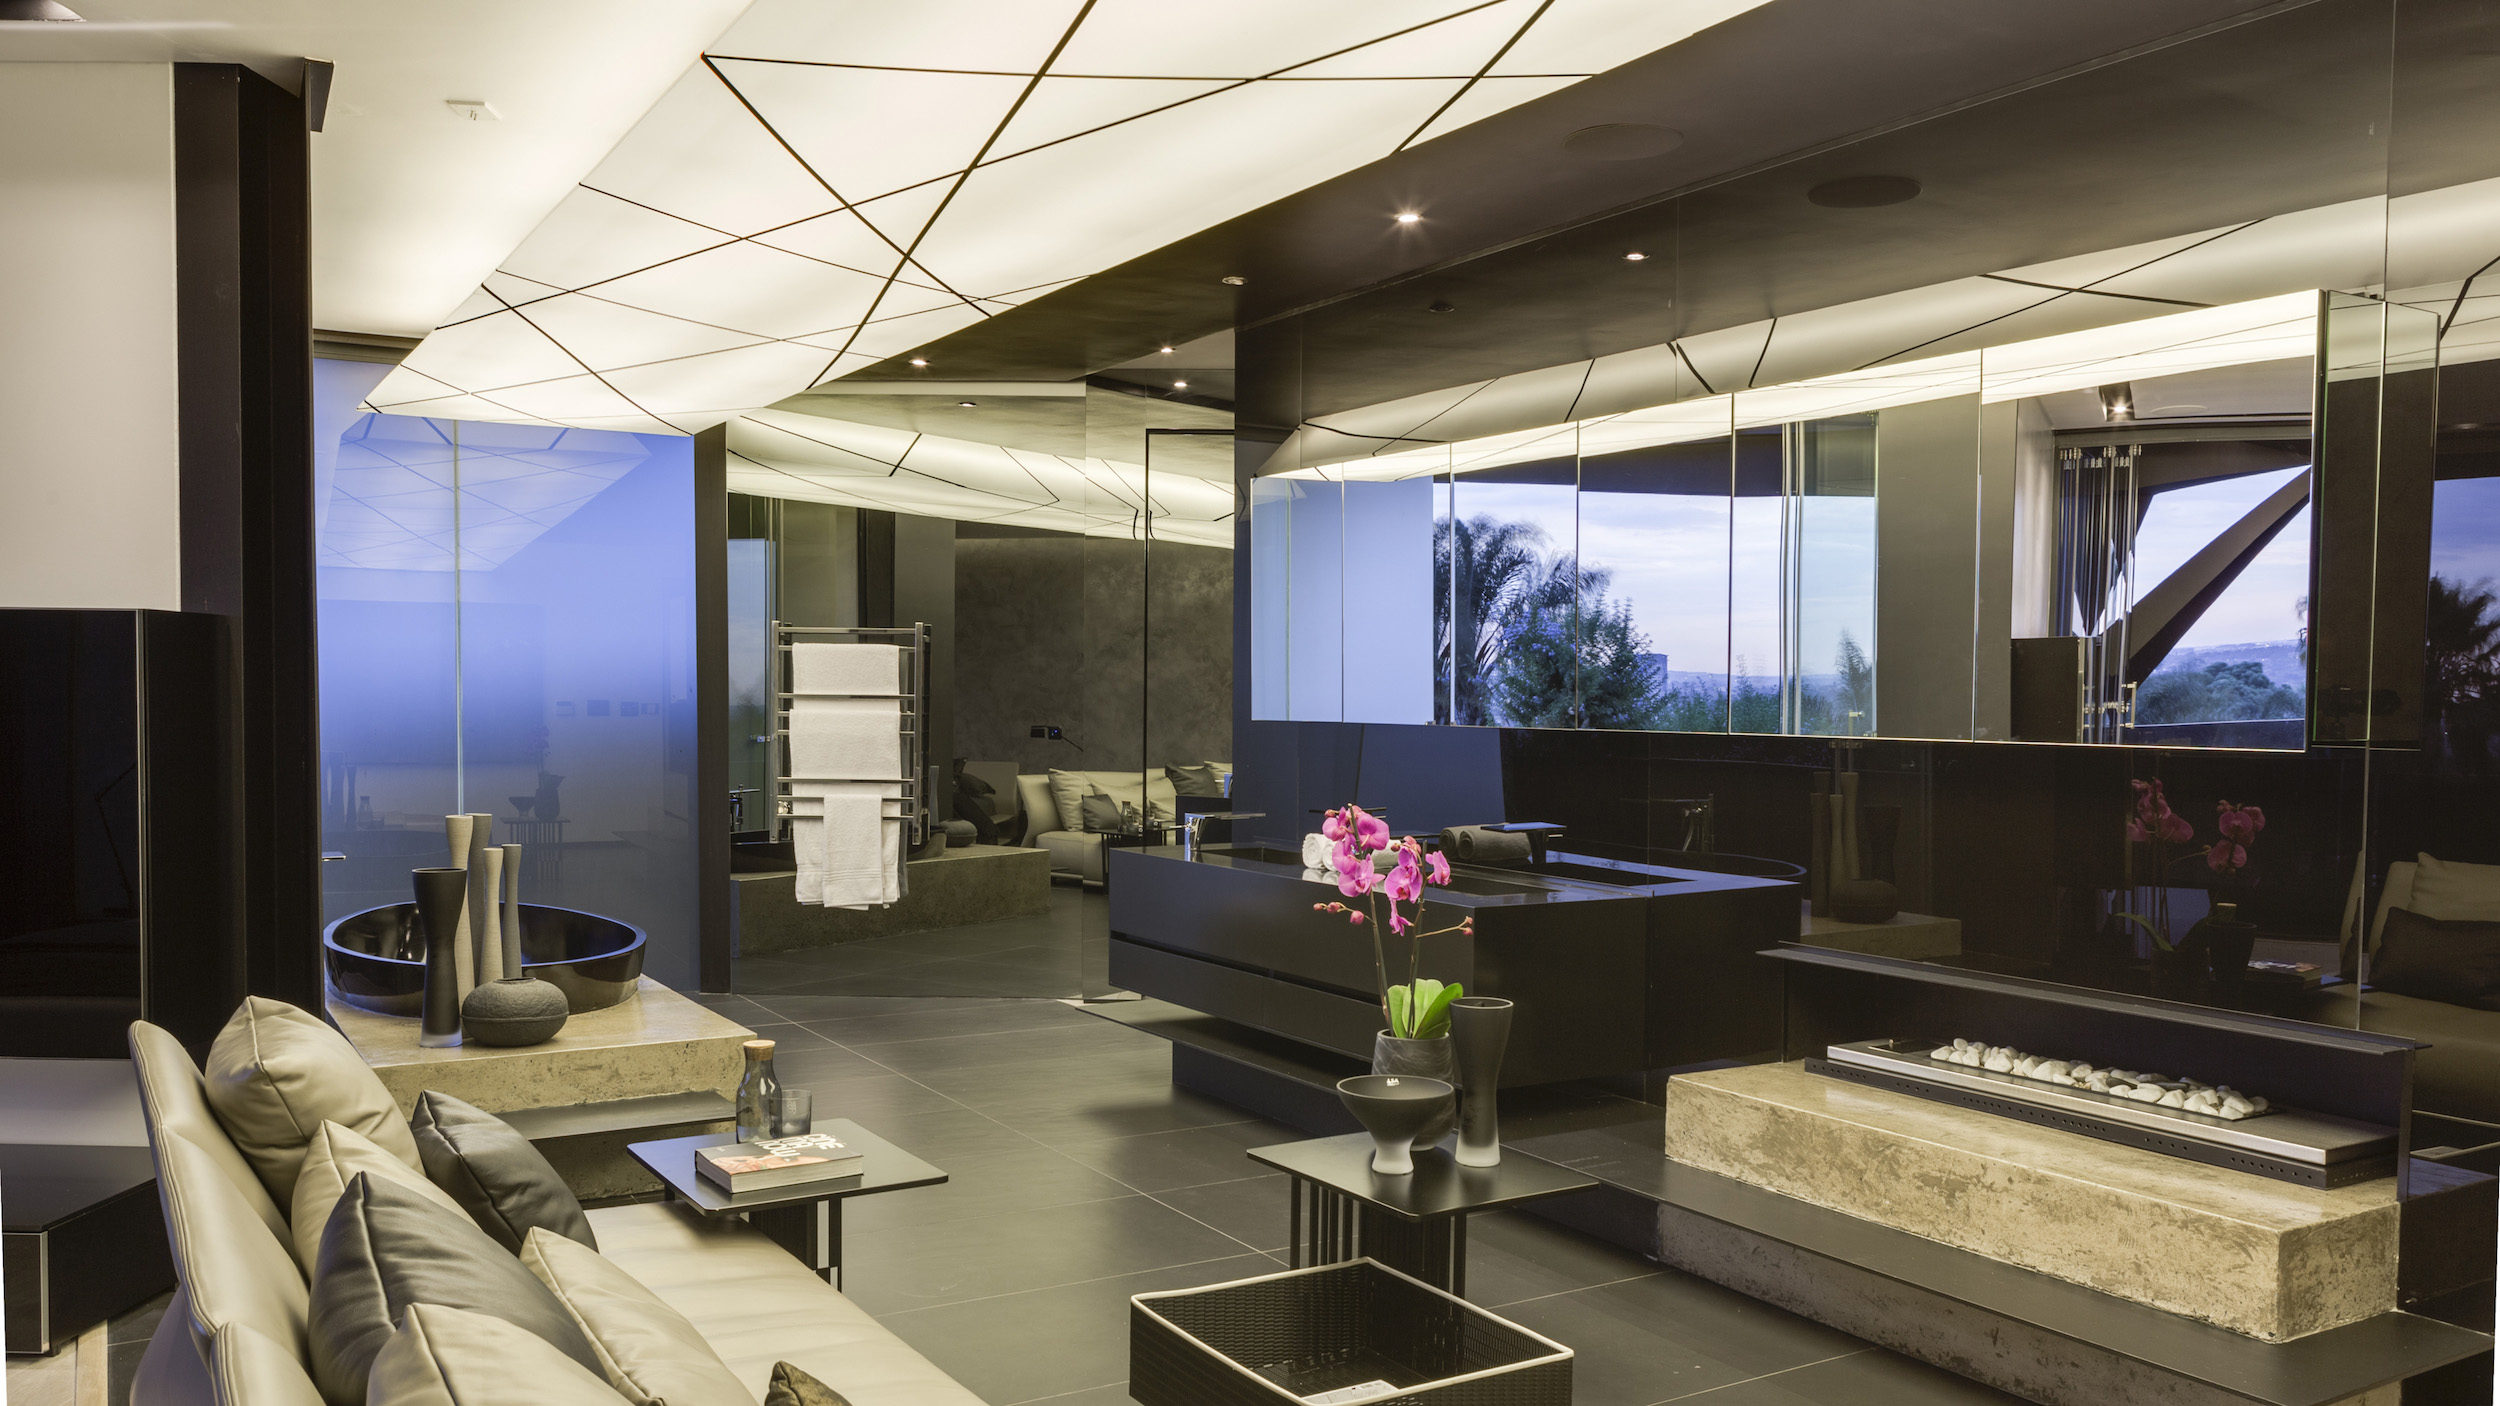 Kloof Road Masterpiece House in Johannesburg by Nico van der Meulen Architects-37